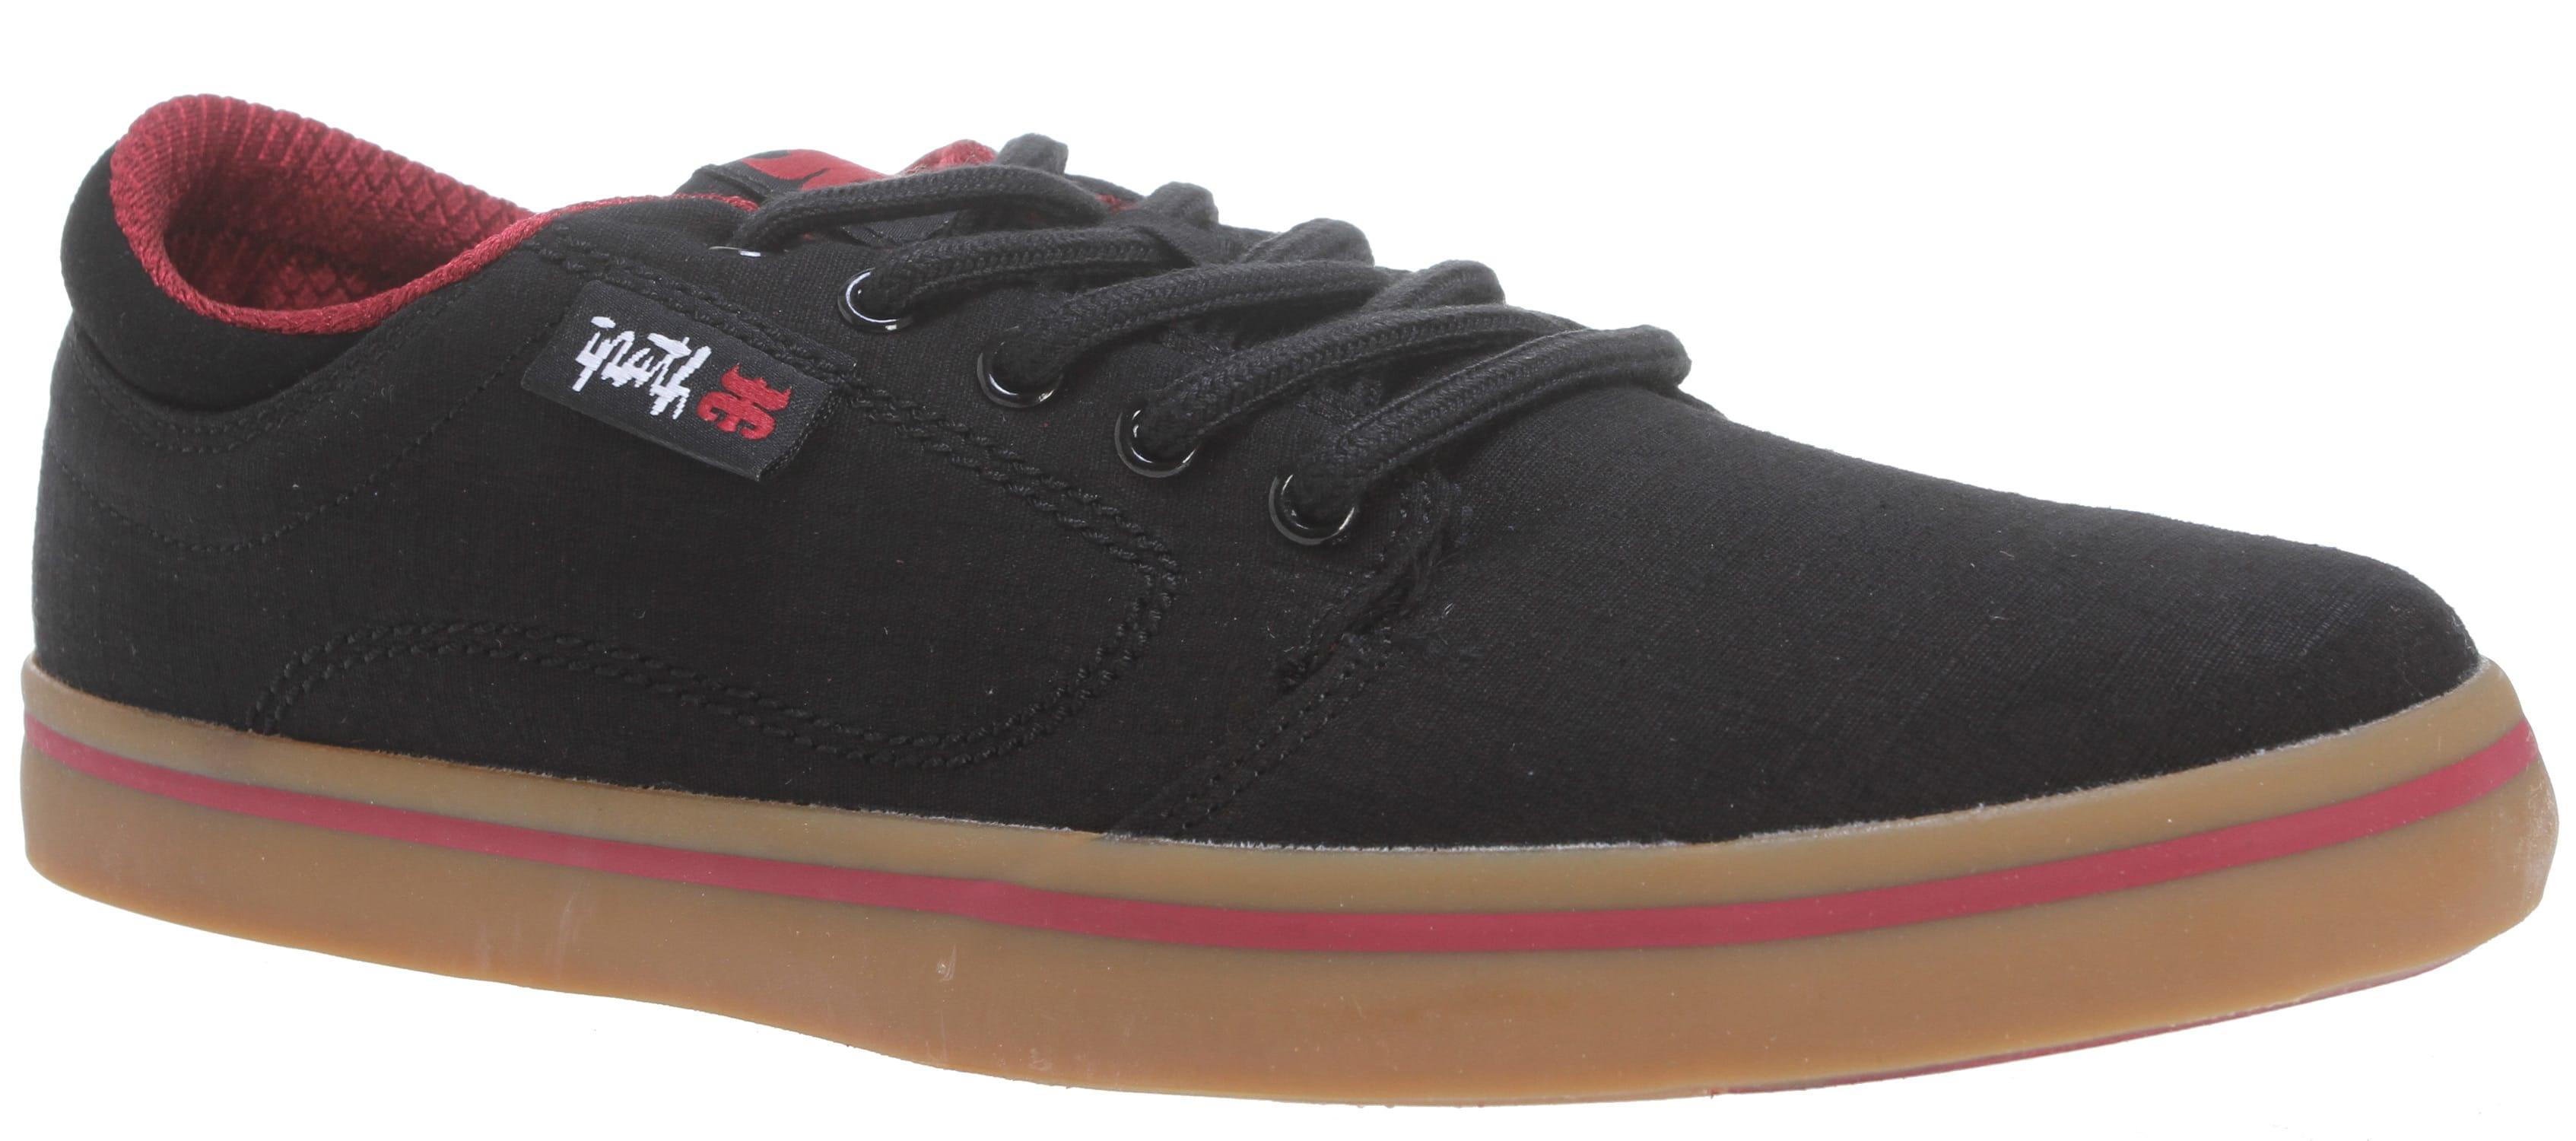 5e43e2ed5a28ad Ipath Funktion S Skate Shoes - thumbnail 2